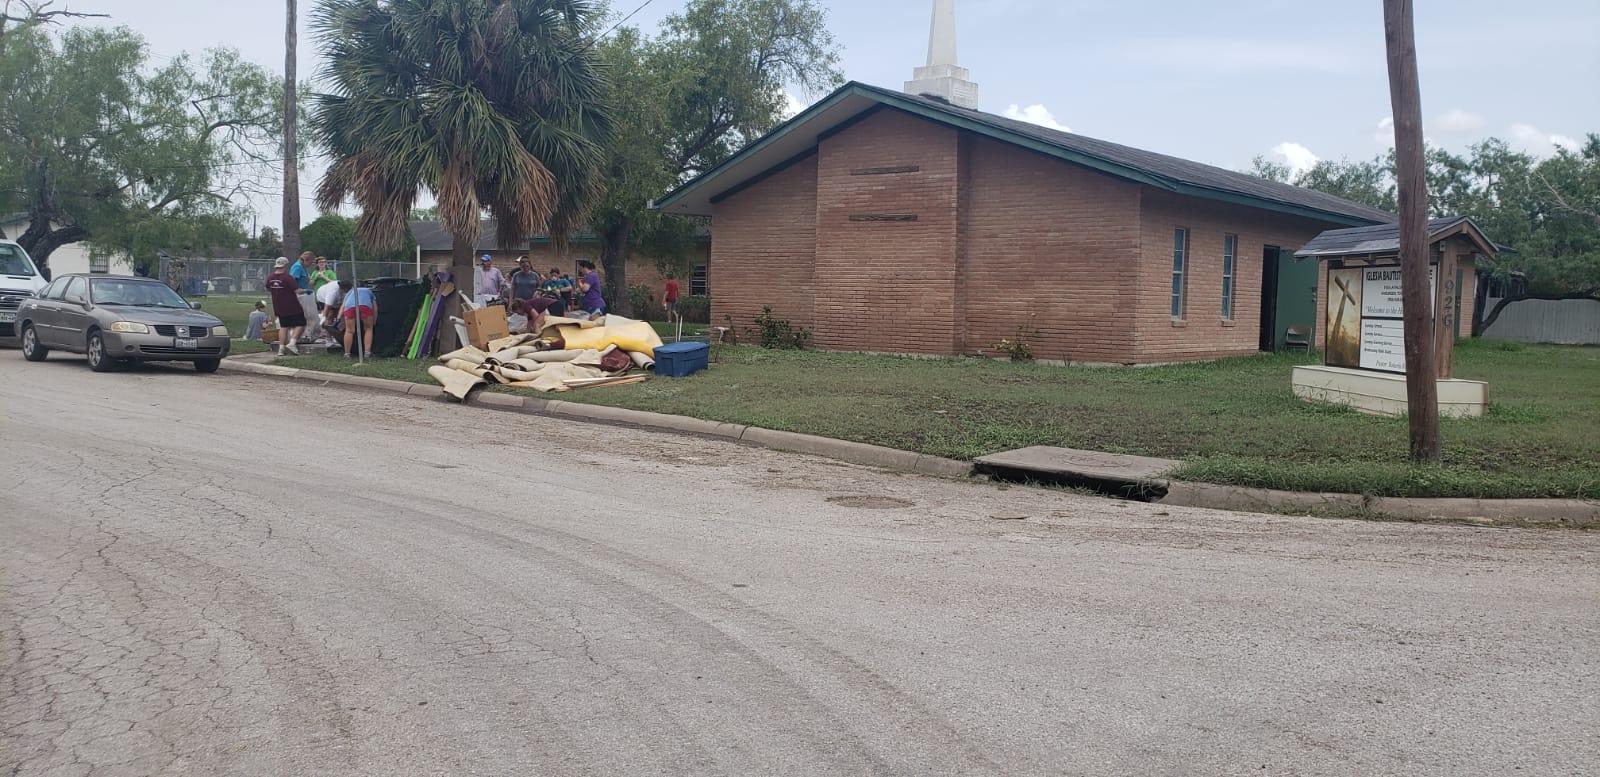 Surveying the damage in Iglesia Bautista Avondale